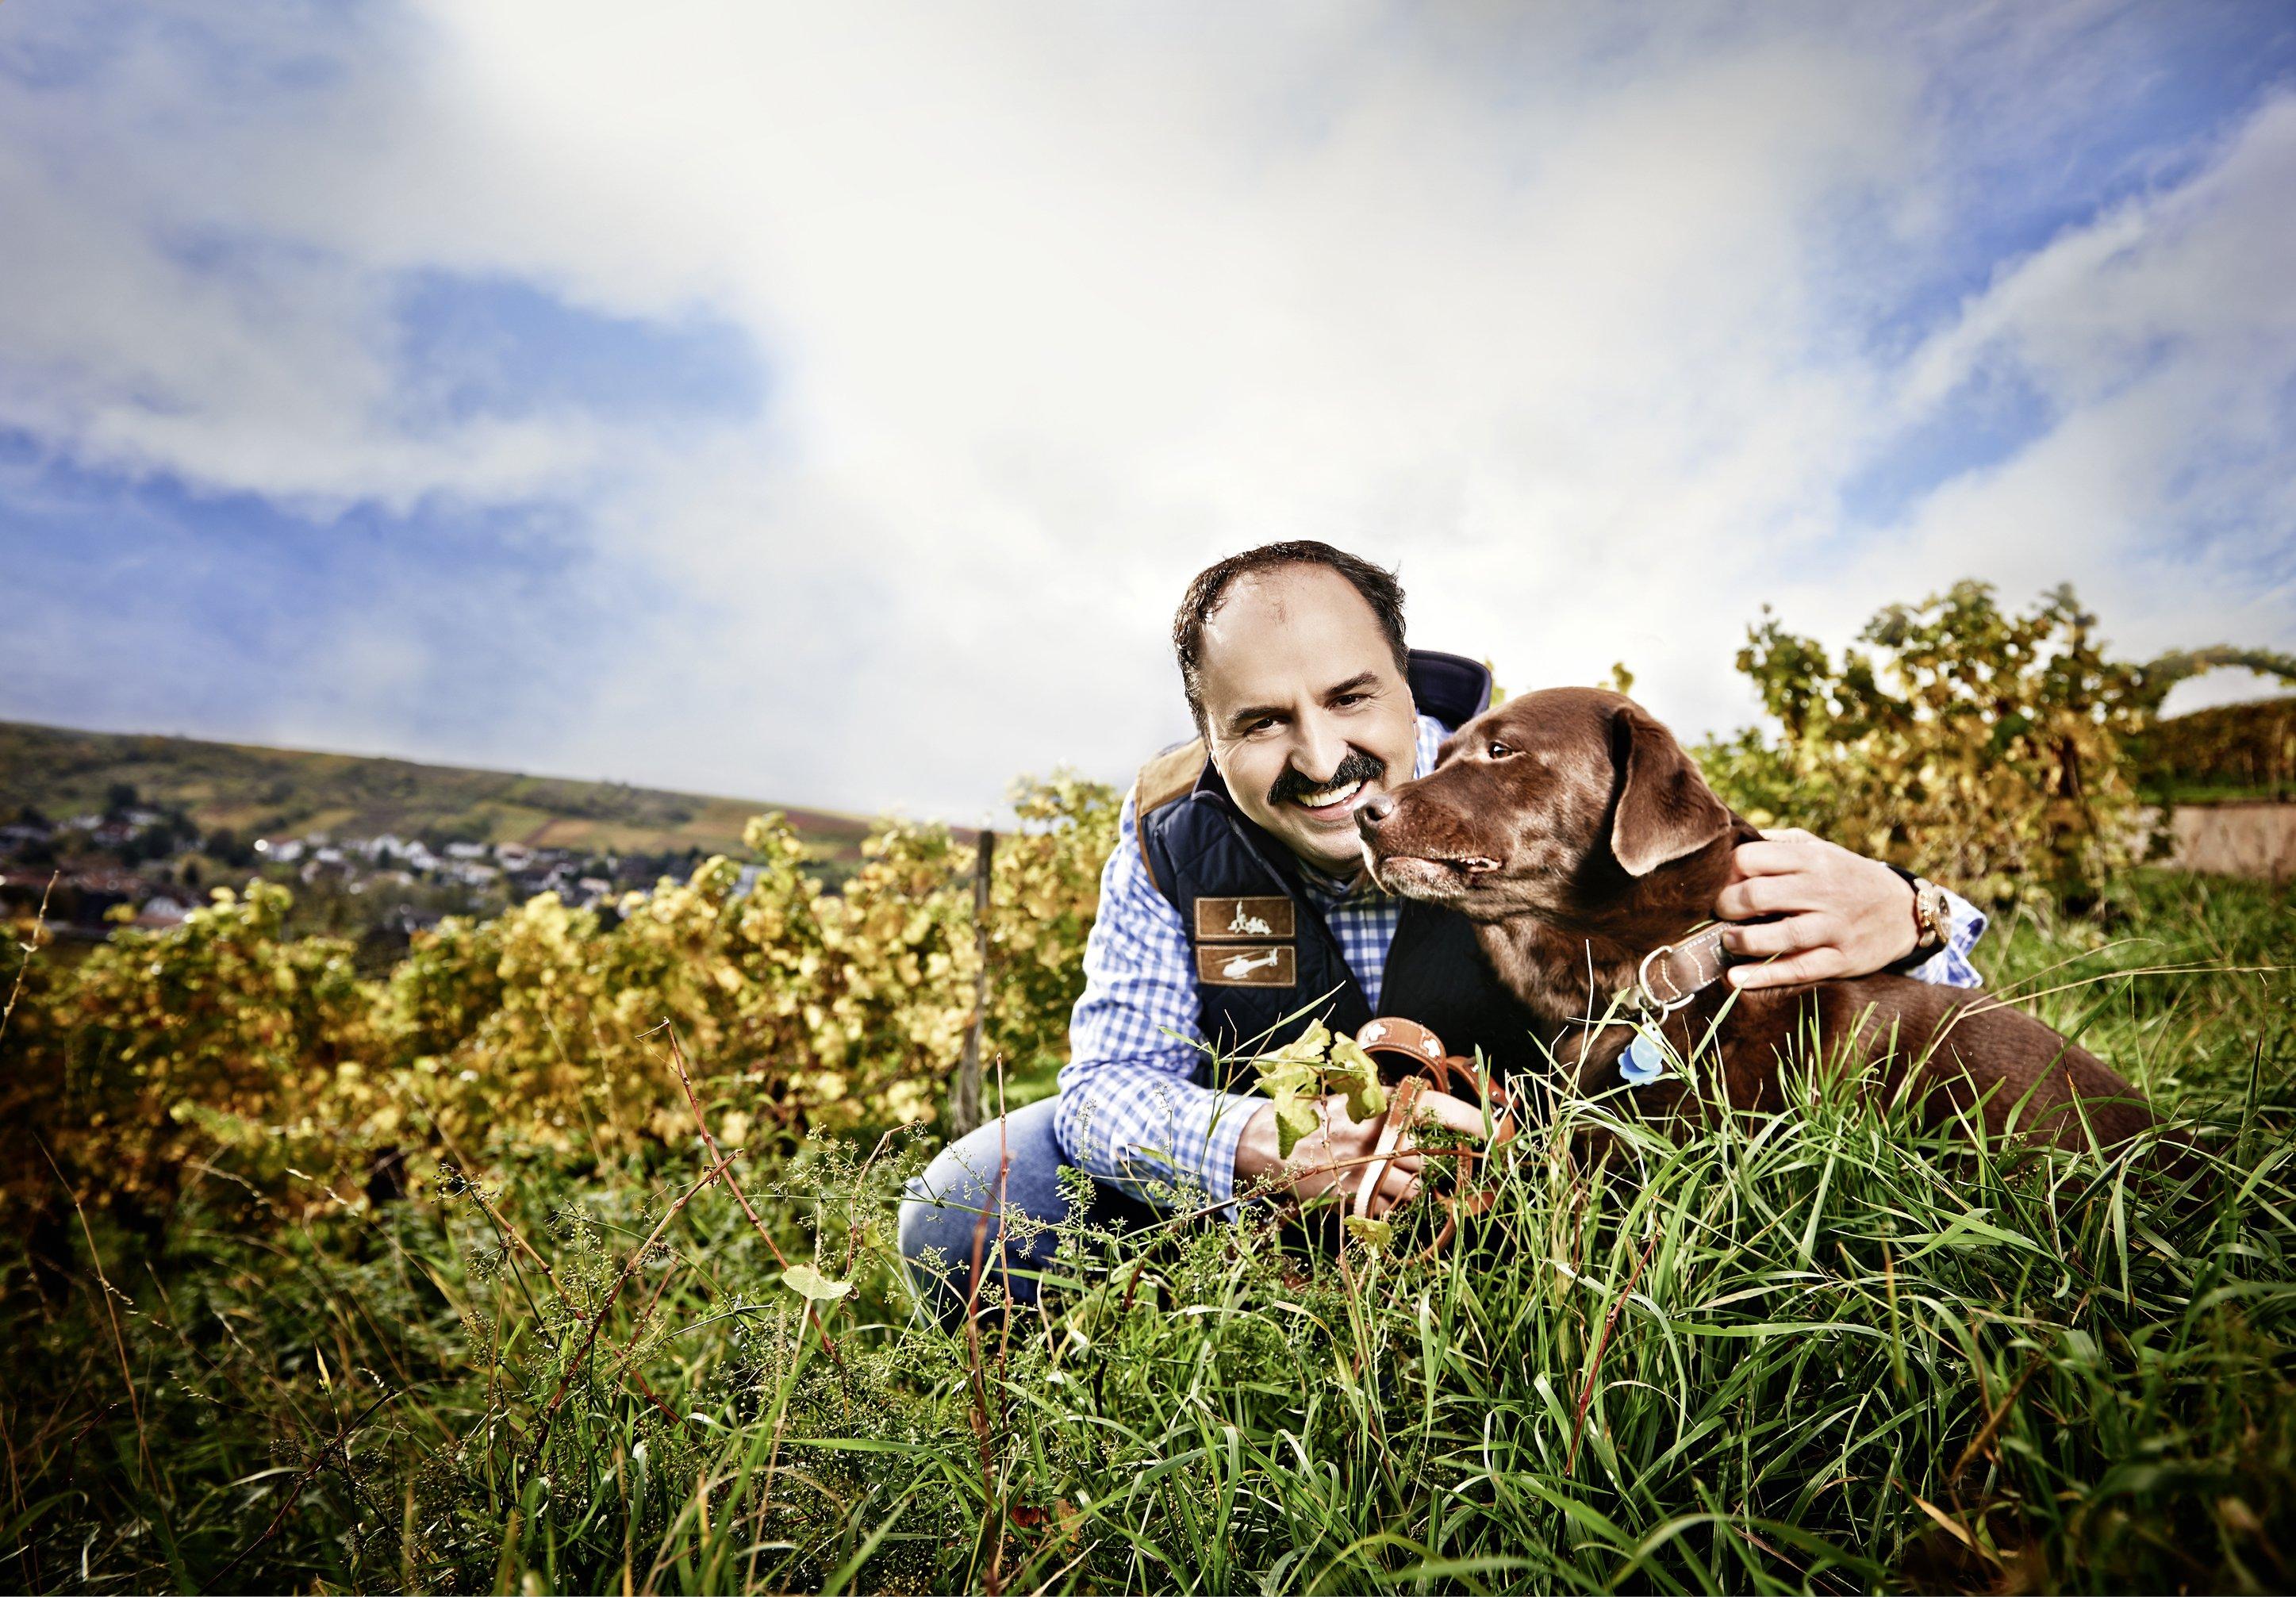 johann-lafer-und-sein-hund-fuer-charity-buch-prominent-mit-hund-foto-nikolaj-georgiew-www.ciaogianna.de